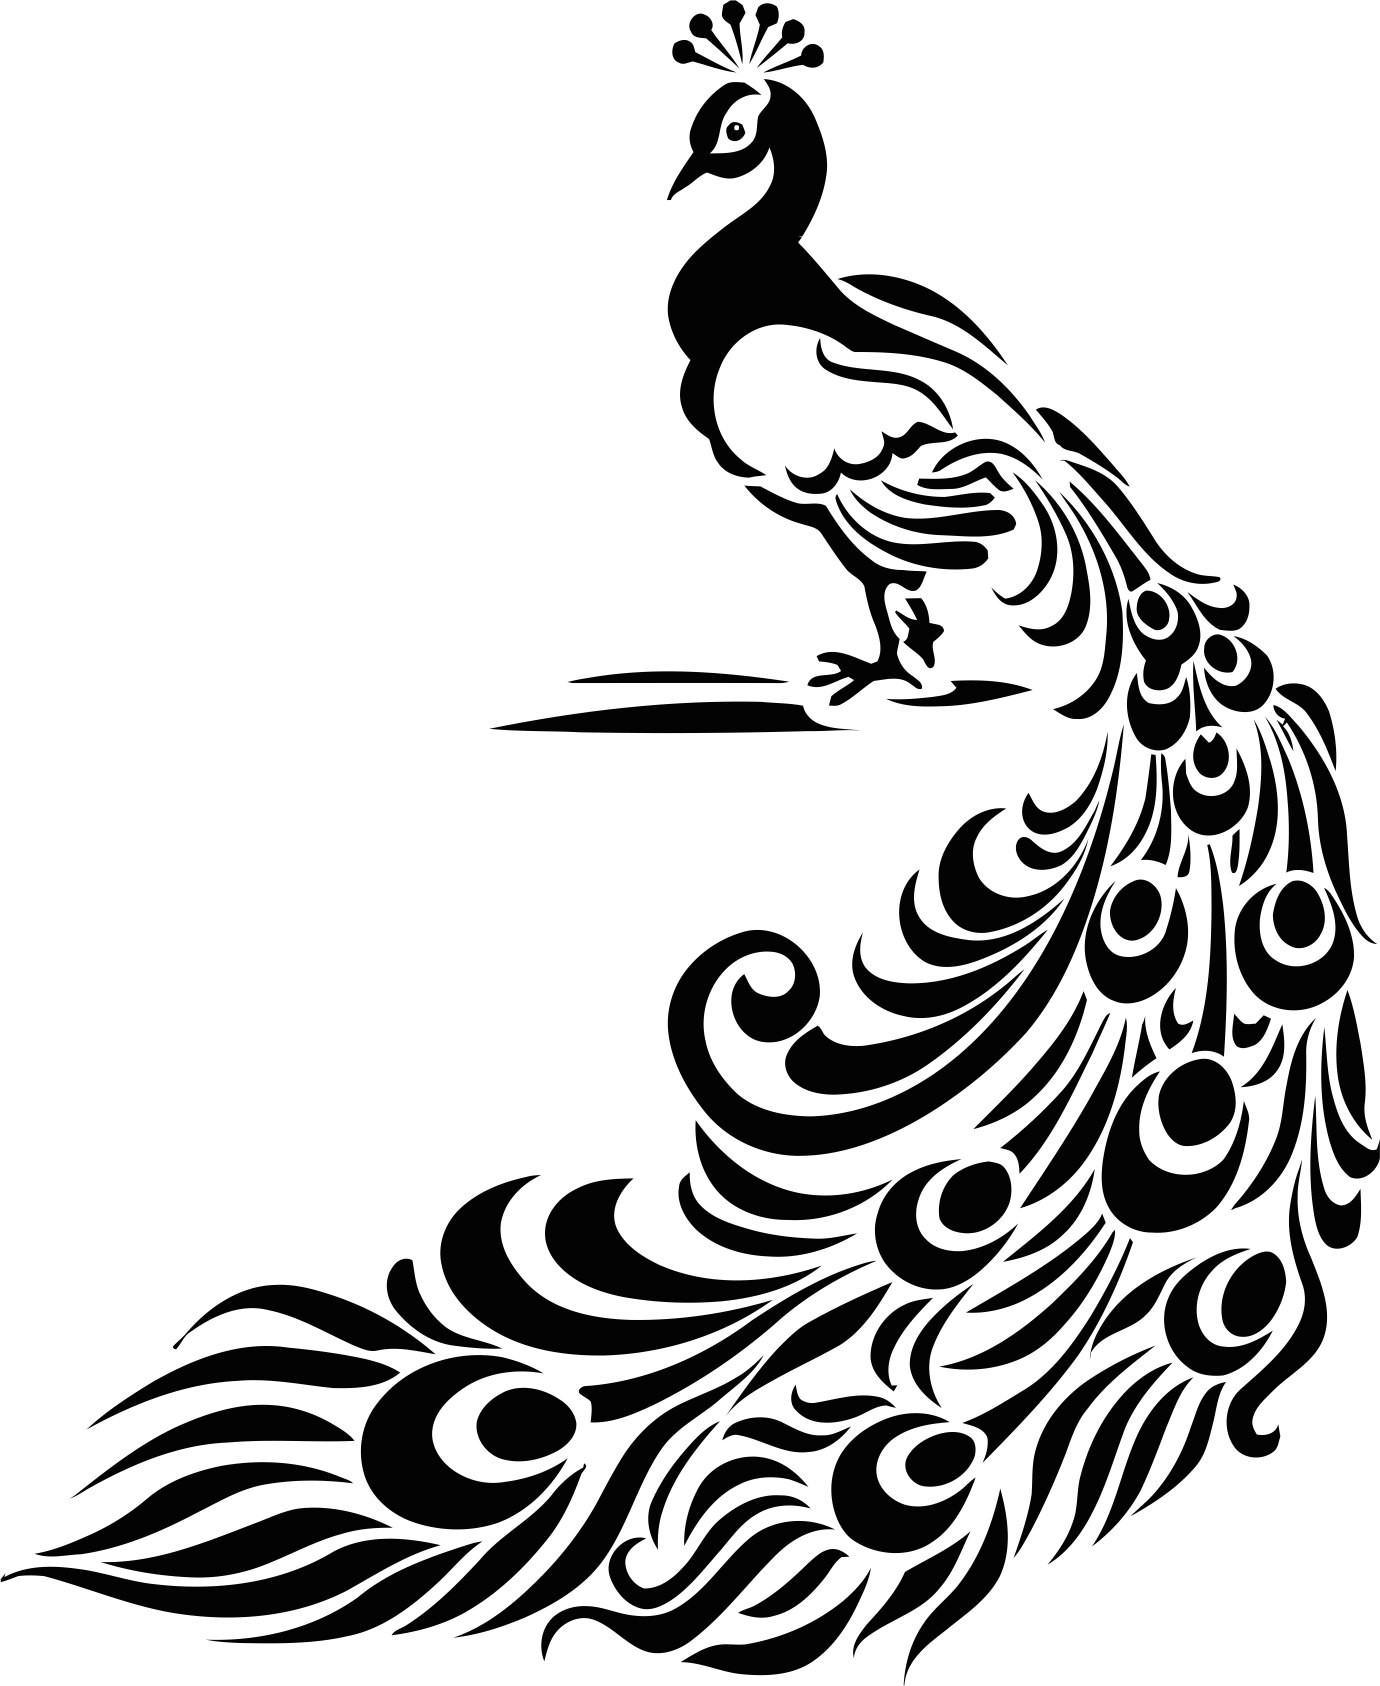 Peacock File Free CDR Vectors Art